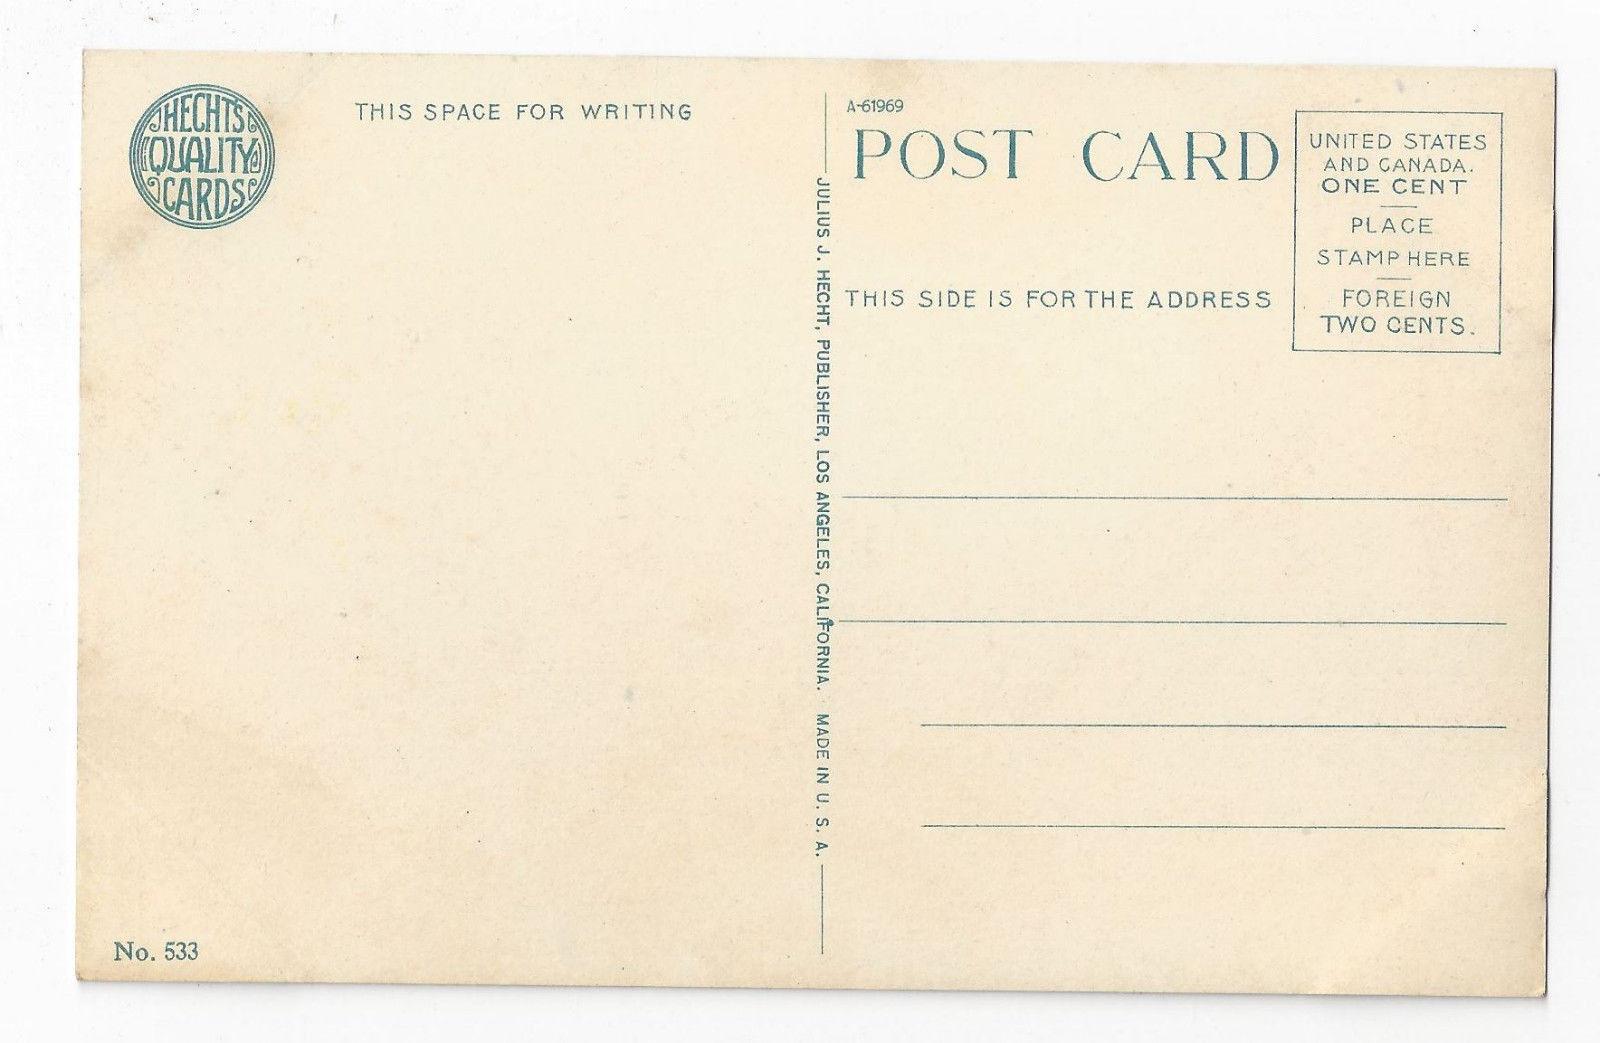 California Rose Arbor Julius J Hecht Quality Cards No. 533 Vintage Postcard